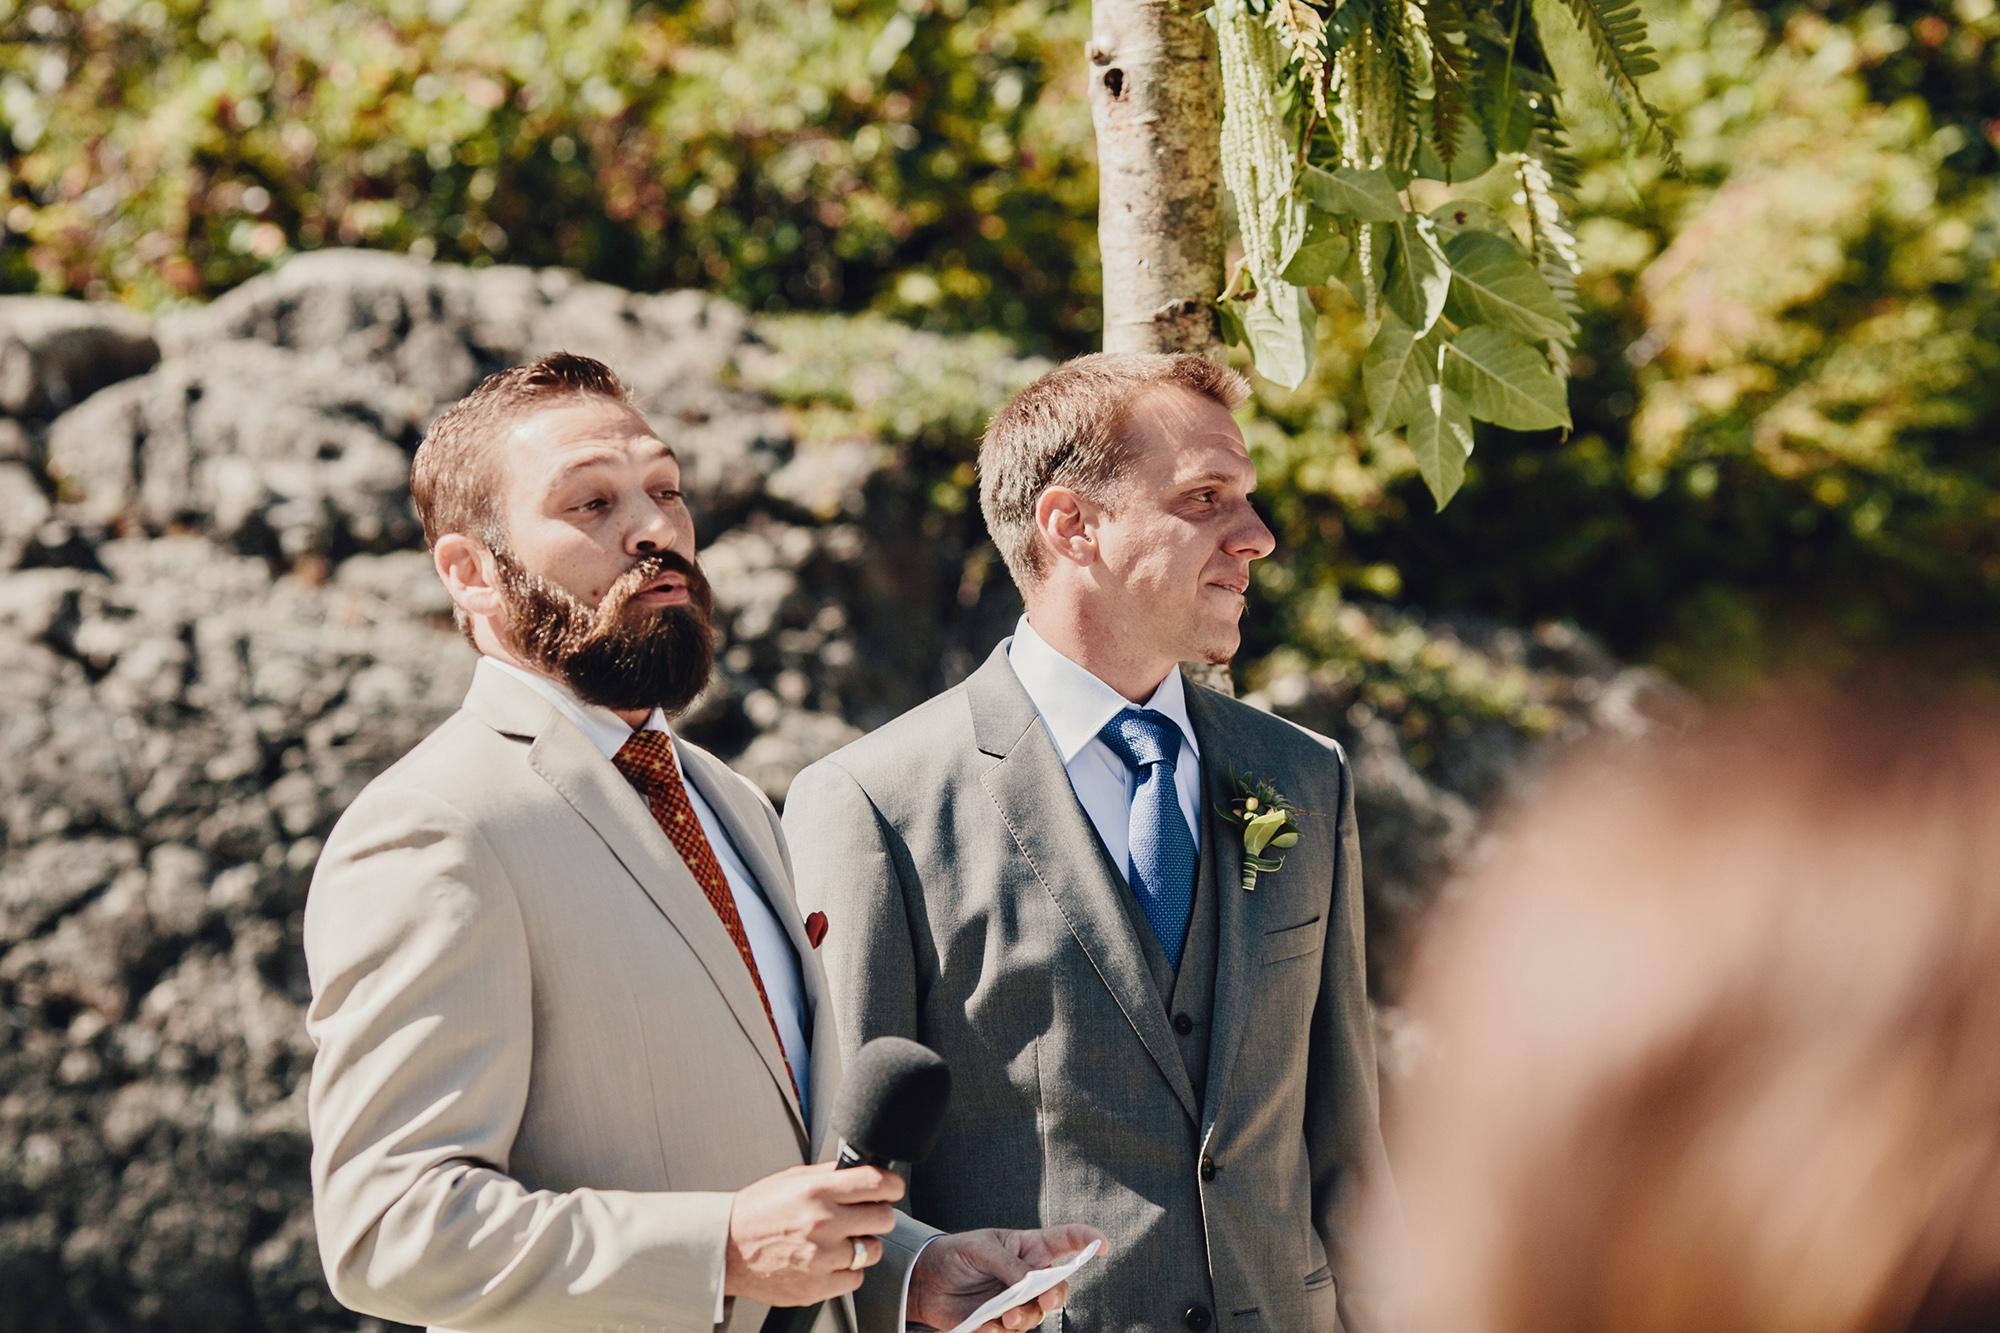 Tofino-Botanical-Gardens-Wedding-Photos-0036.jpg